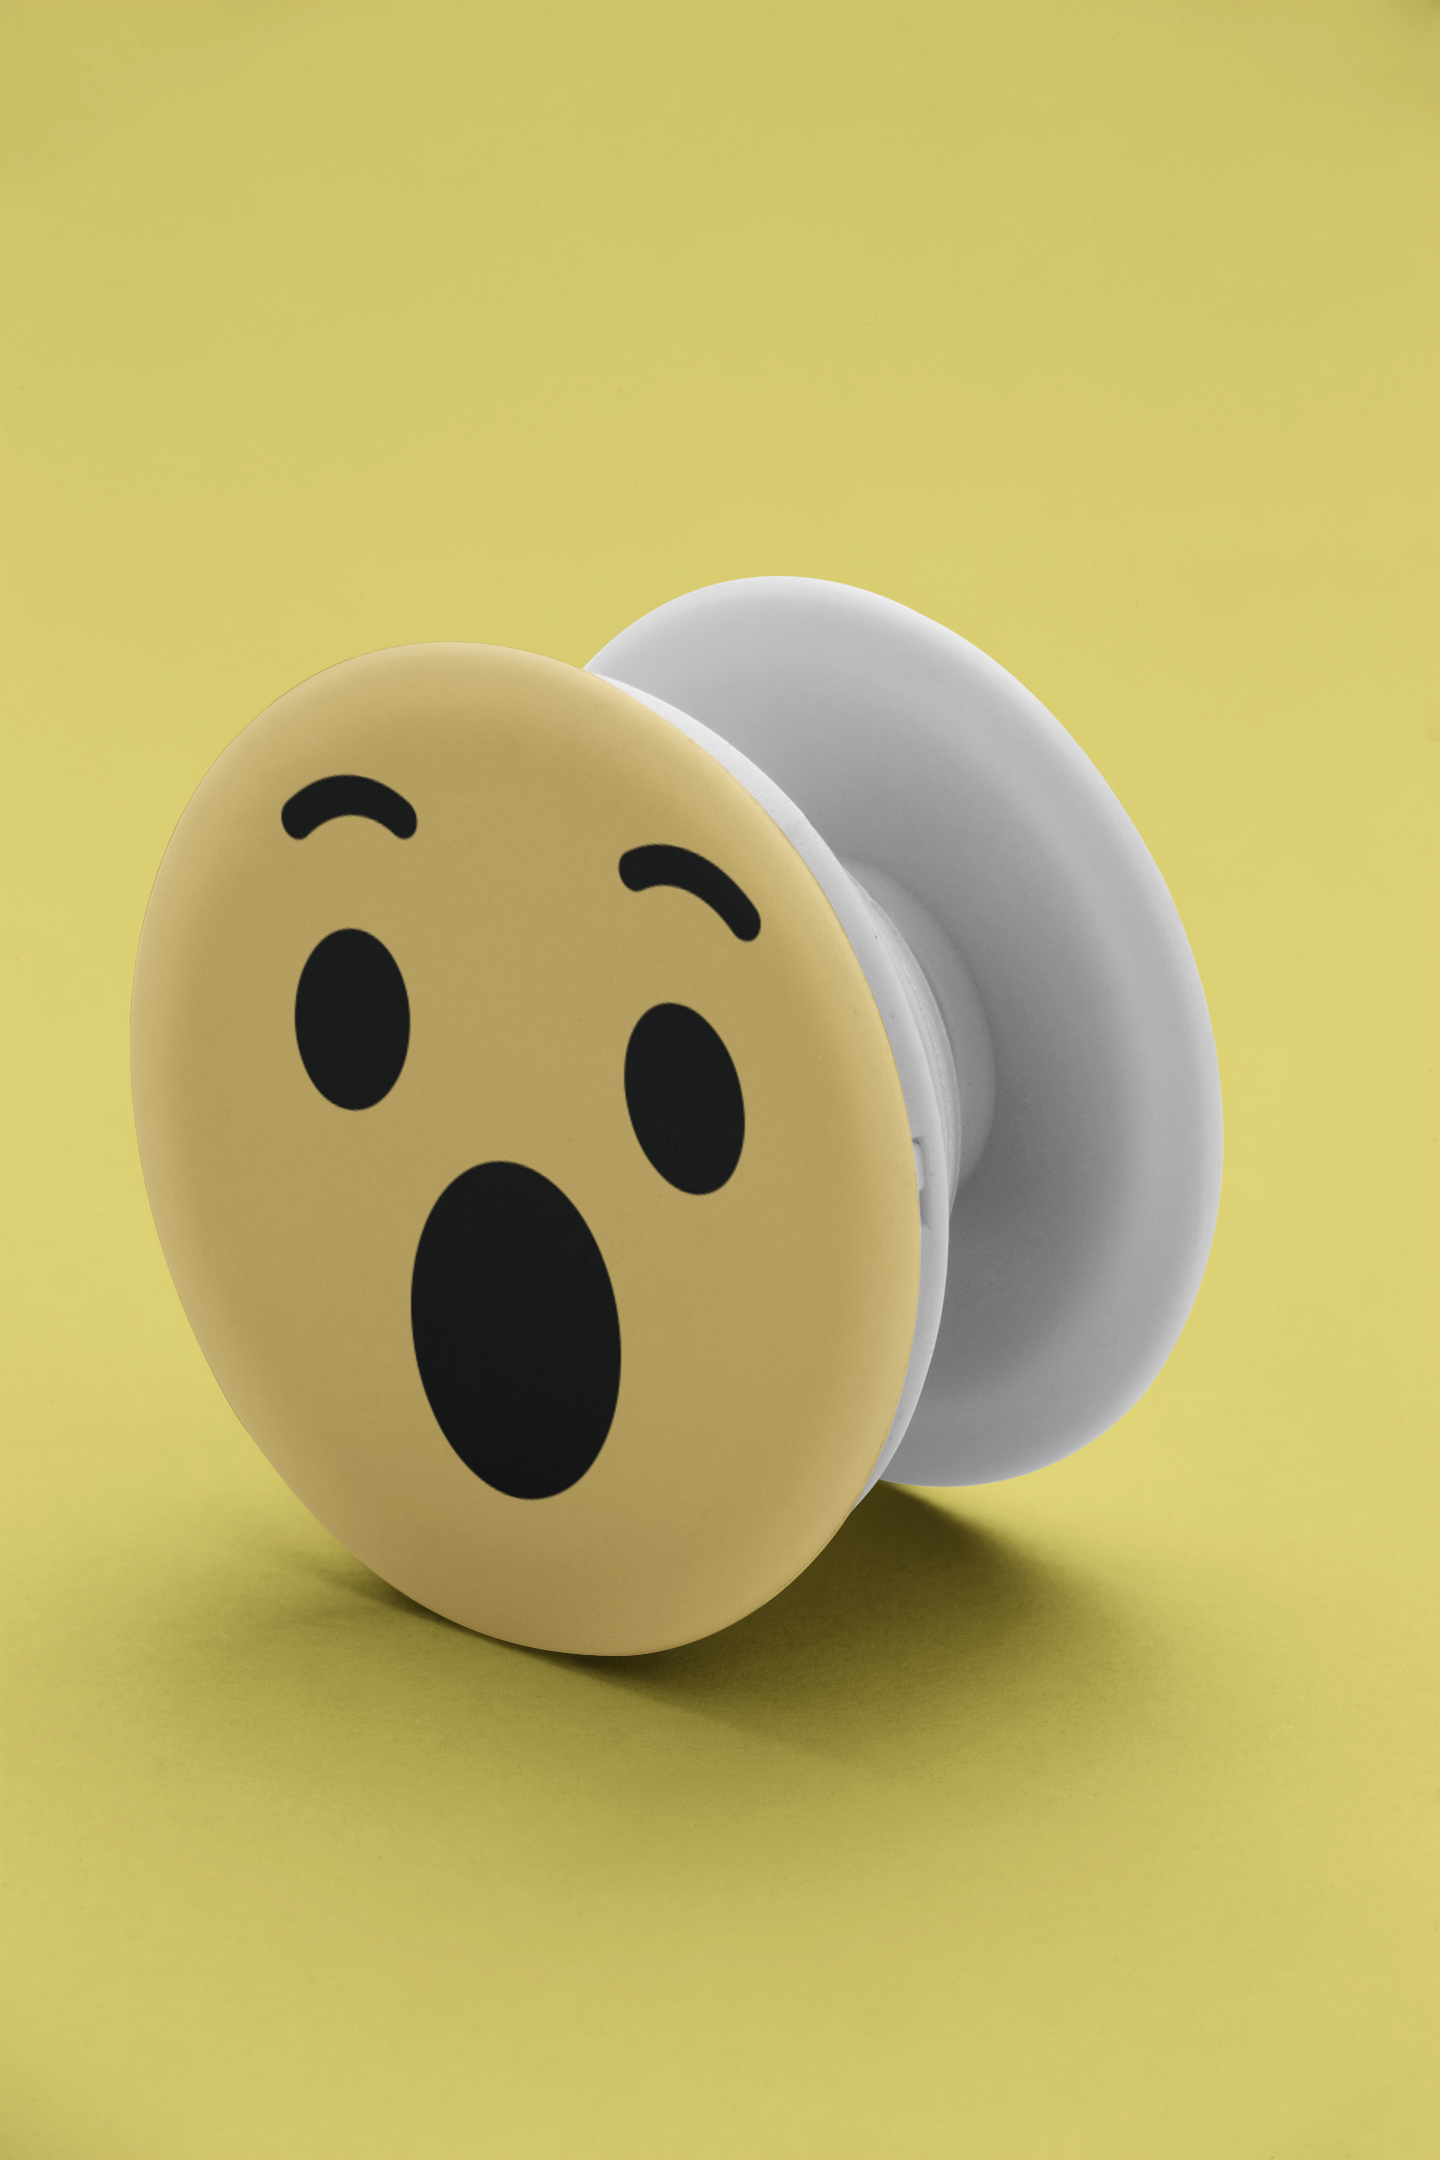 Surprised Emoji Popsocket Popsockets Cool Emoji Emoji